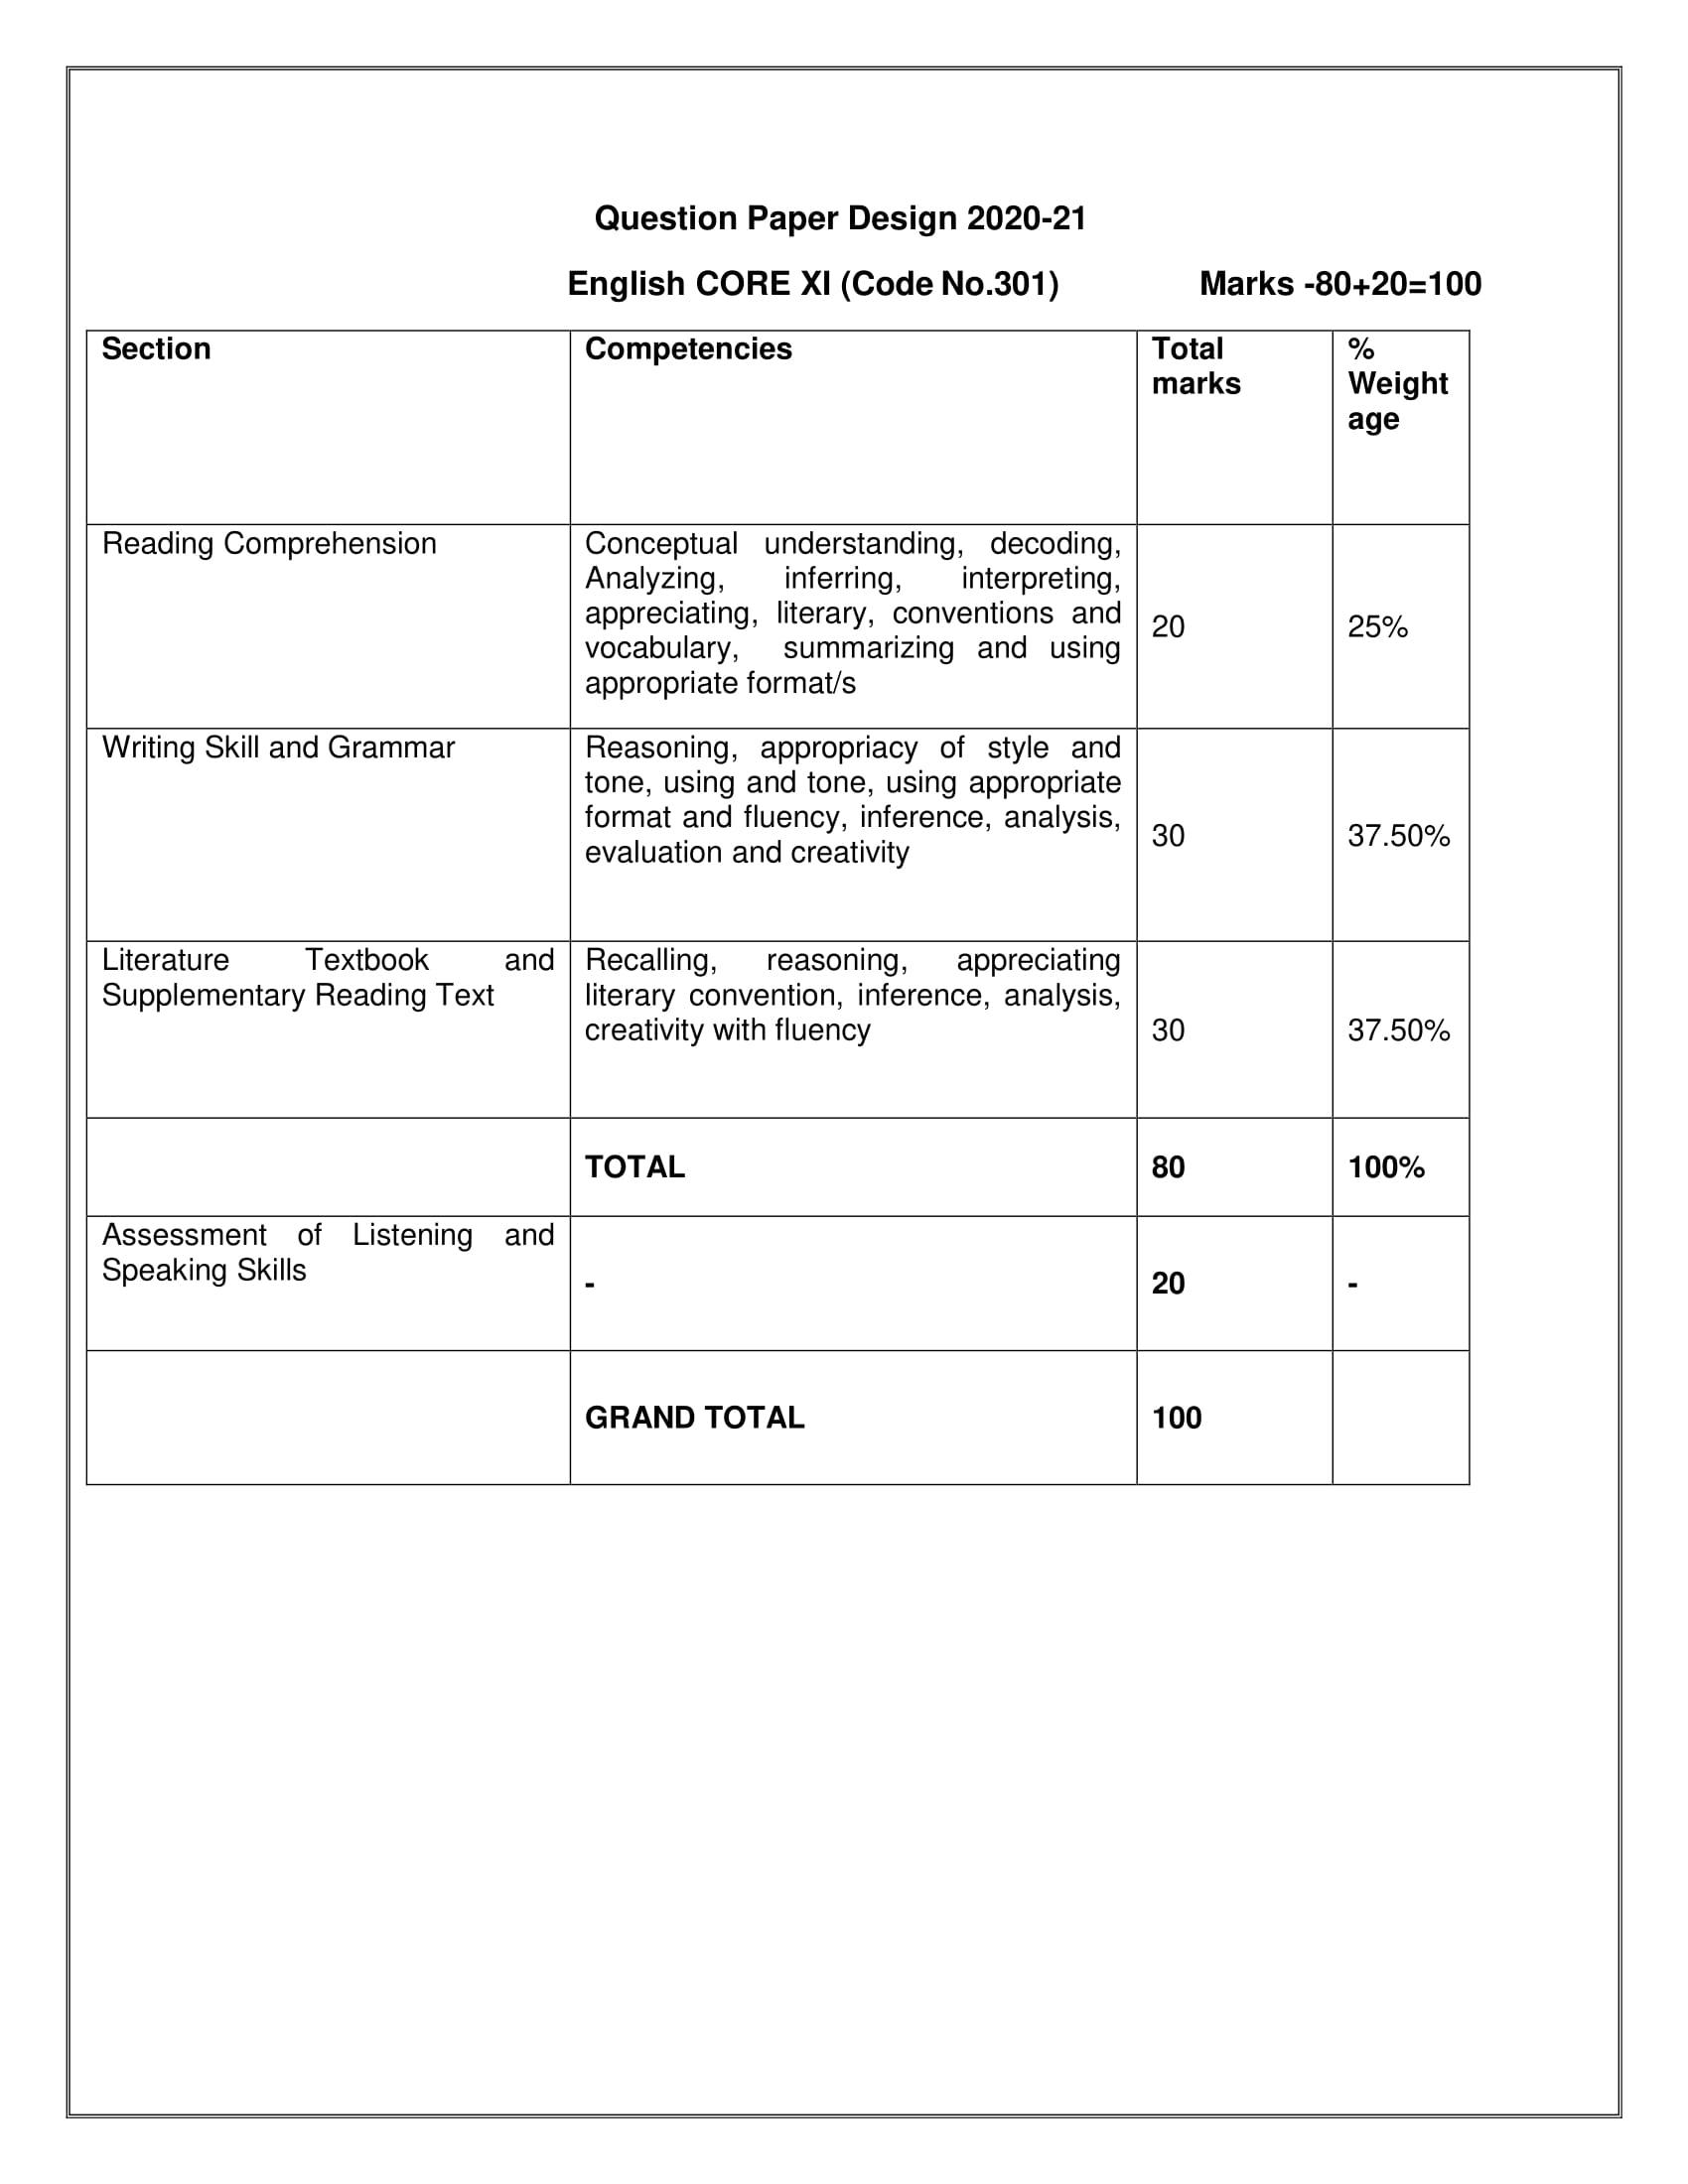 English.core Sr.Sec 2020 21 10